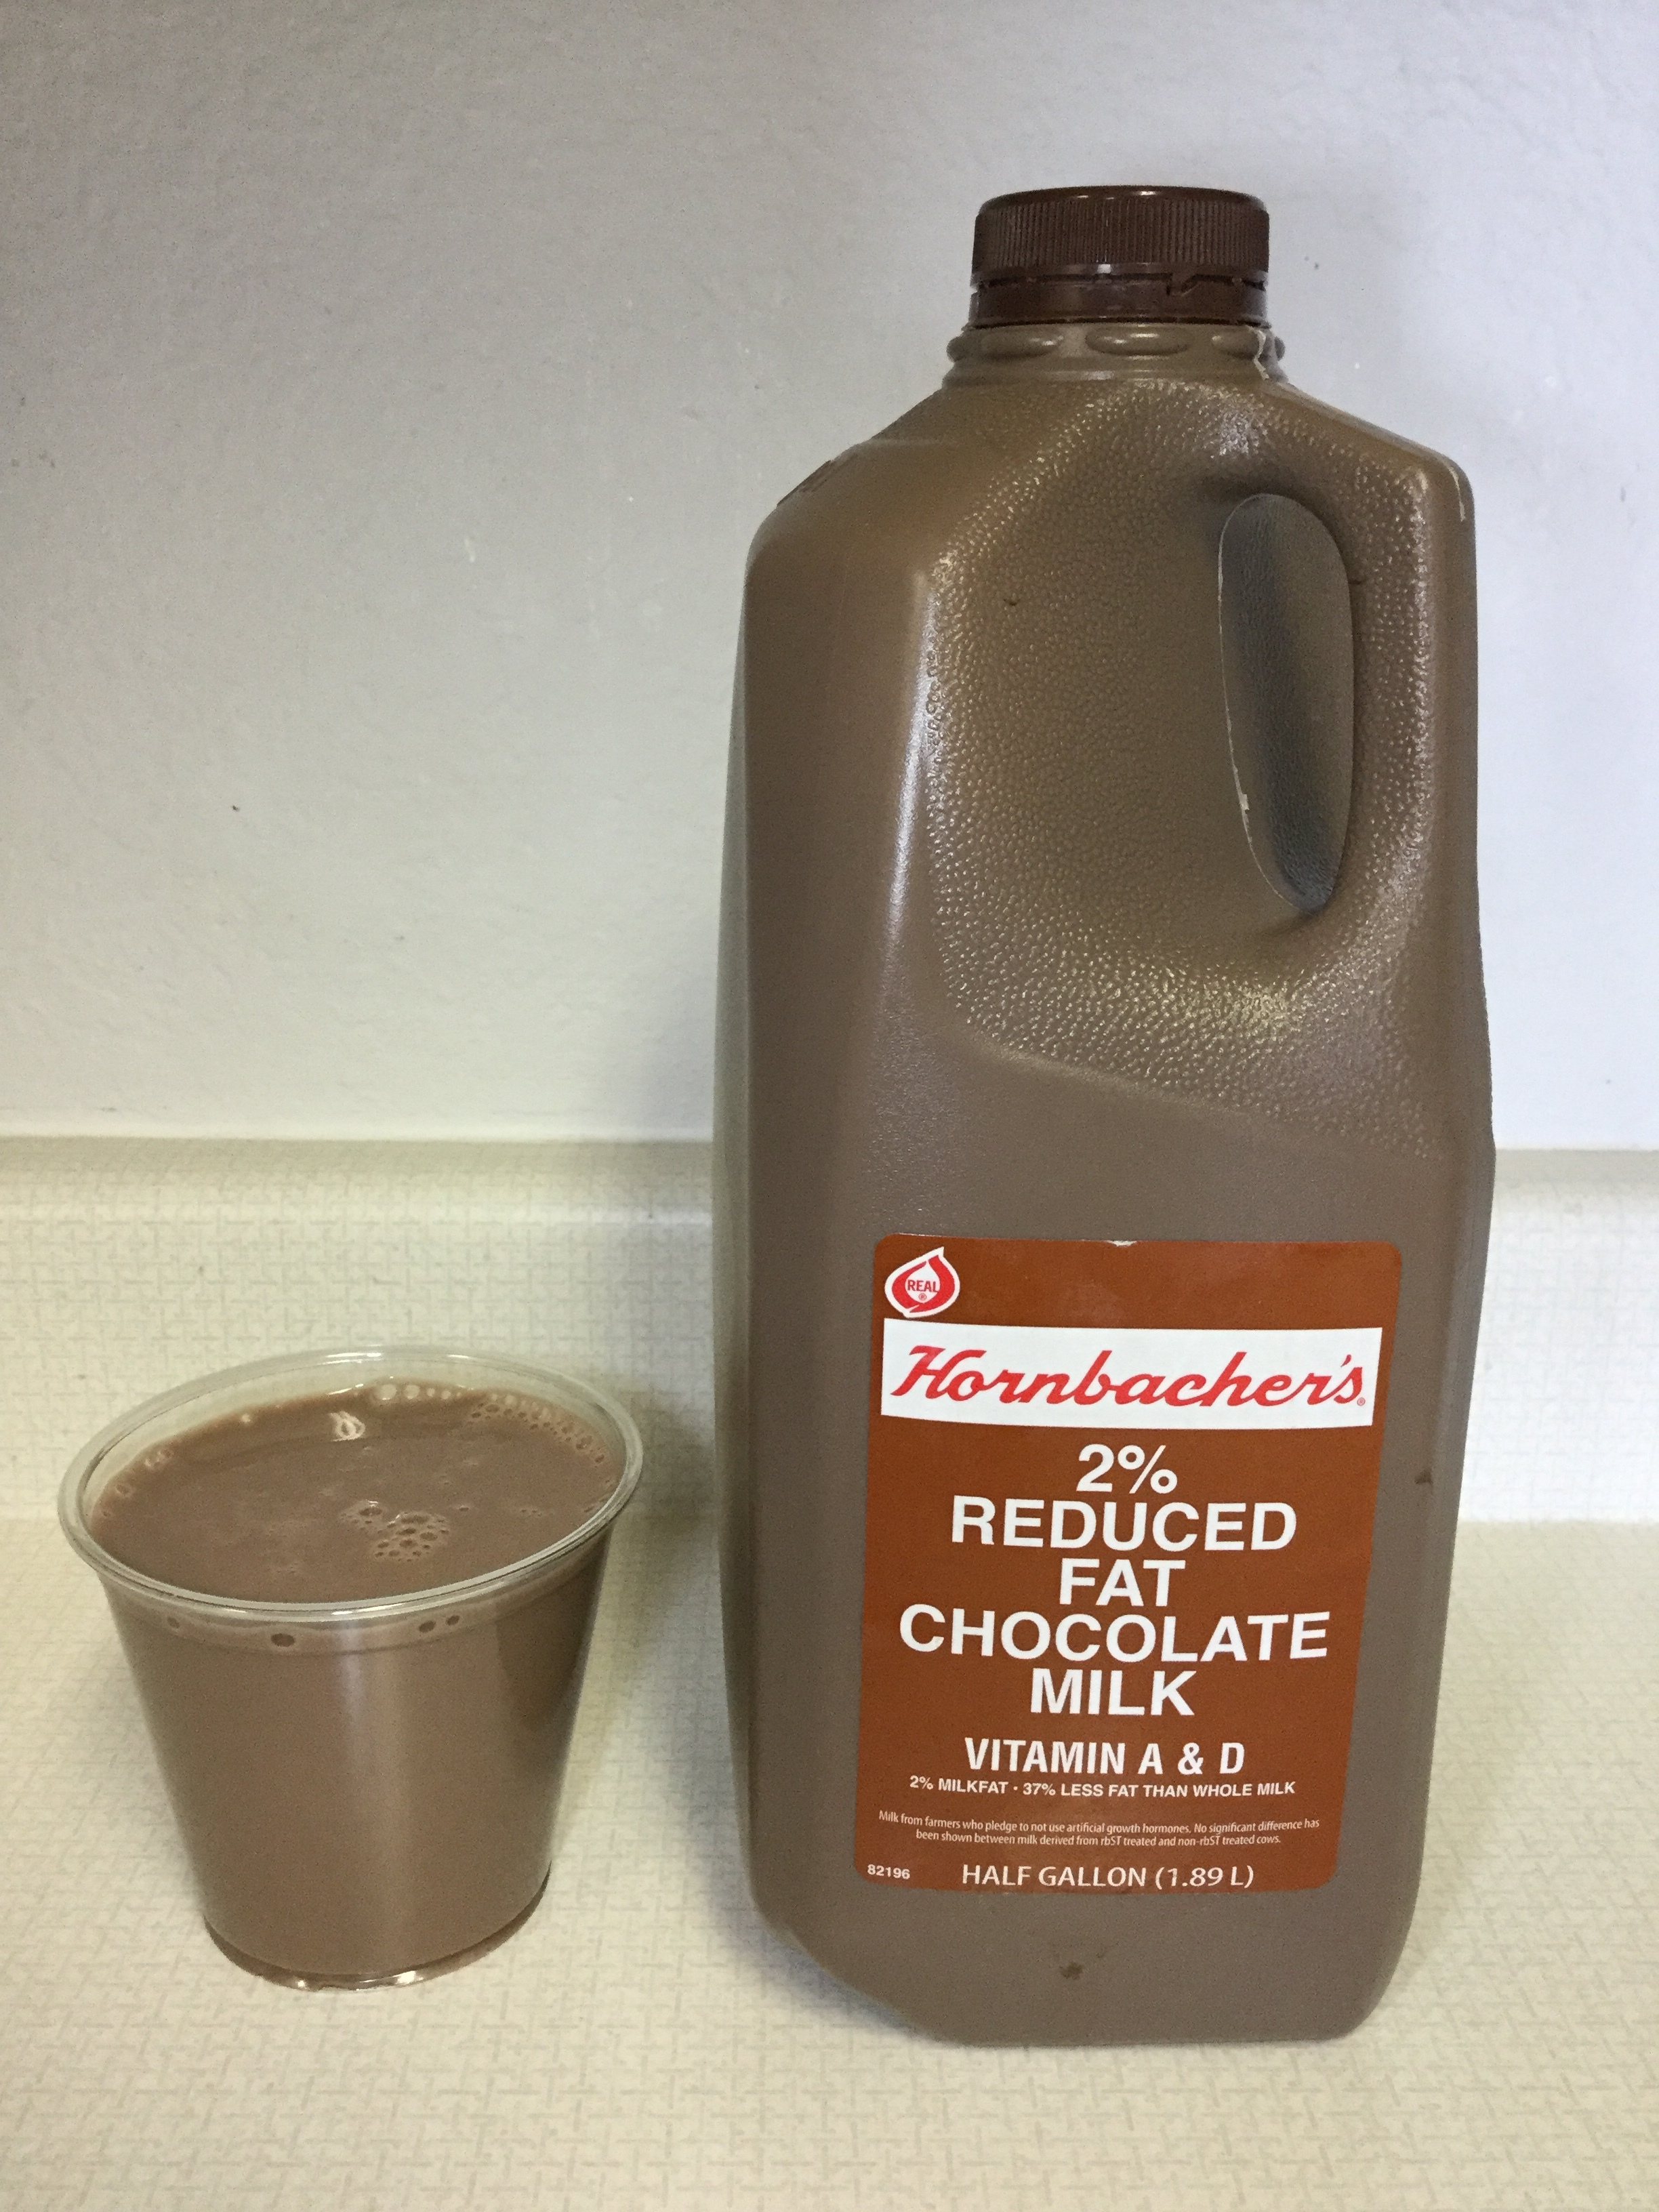 Hornbacher's 2% Reduced Fat Chocolate Milk Cup